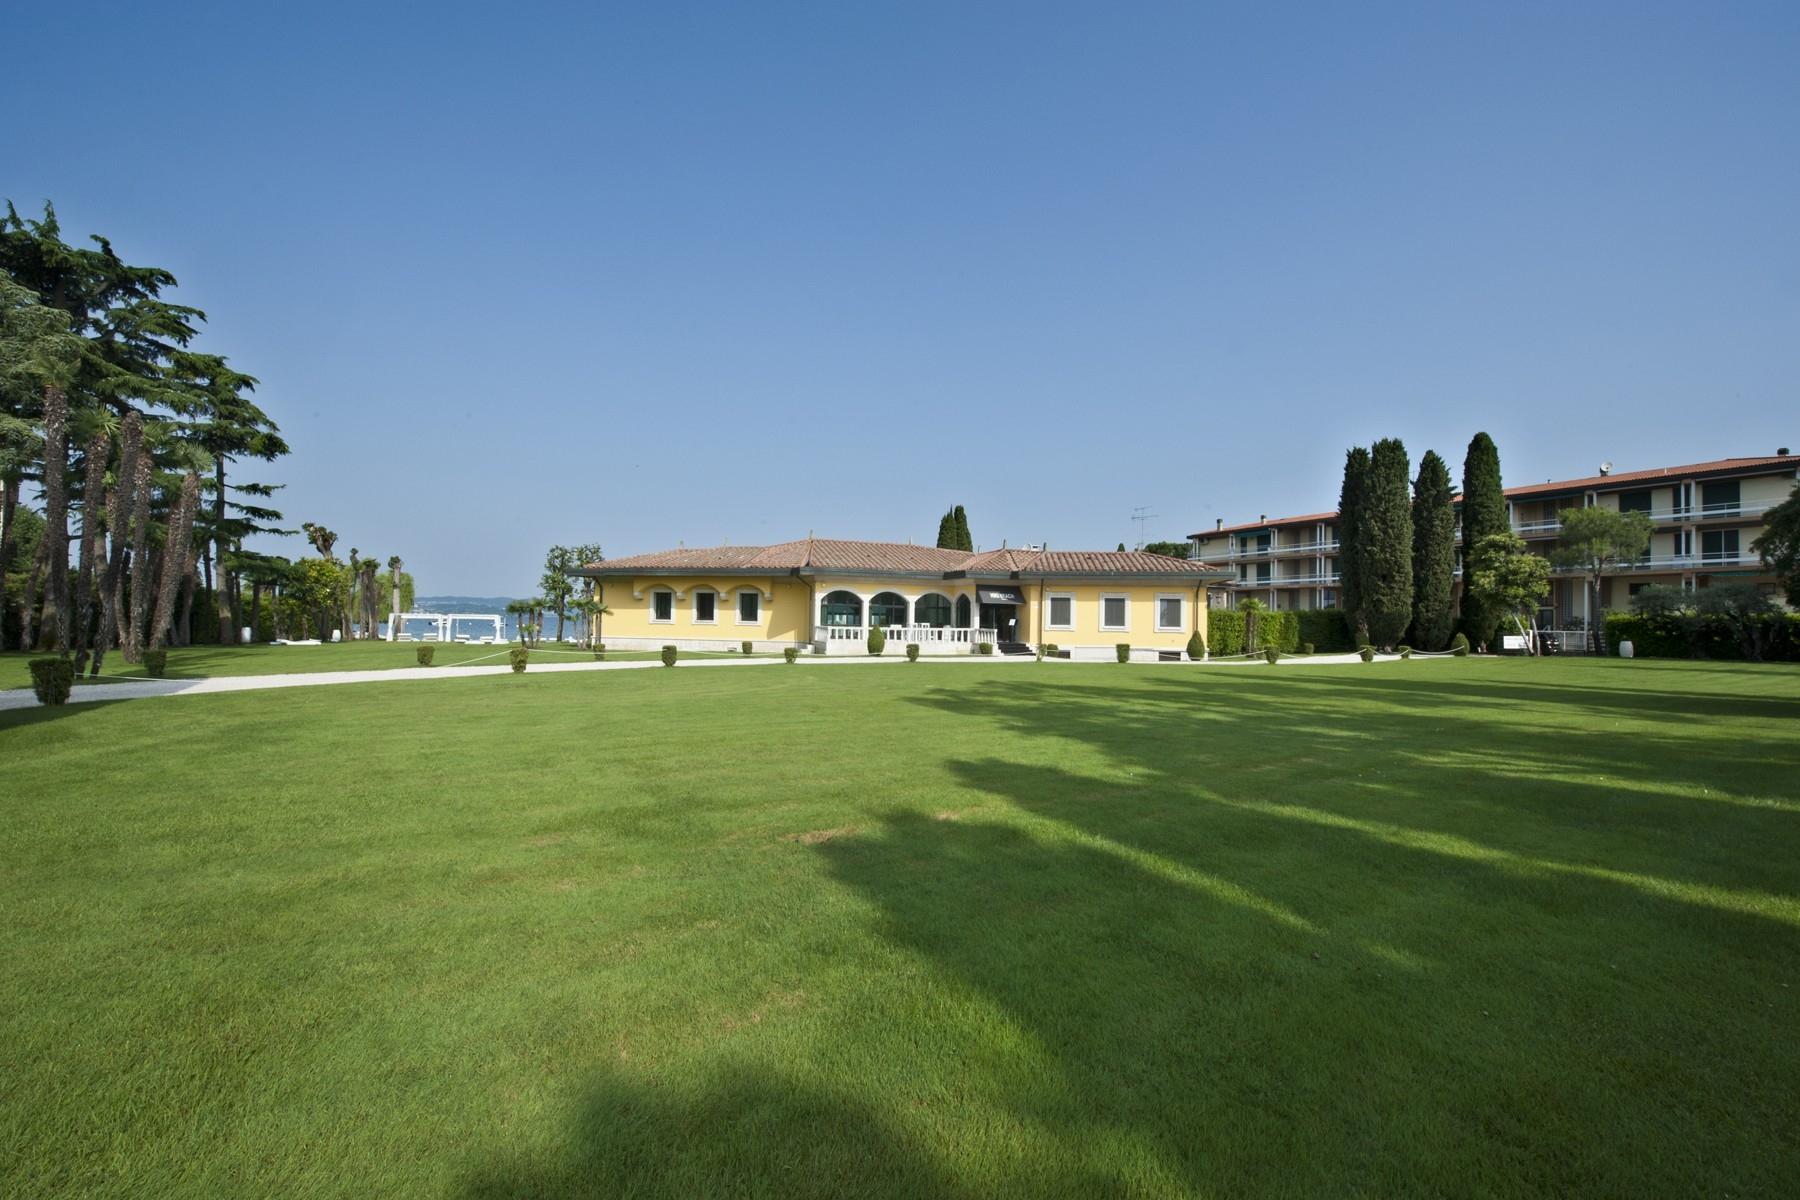 Villa in Vendita a Sirmione: 5 locali, 550 mq - Foto 5